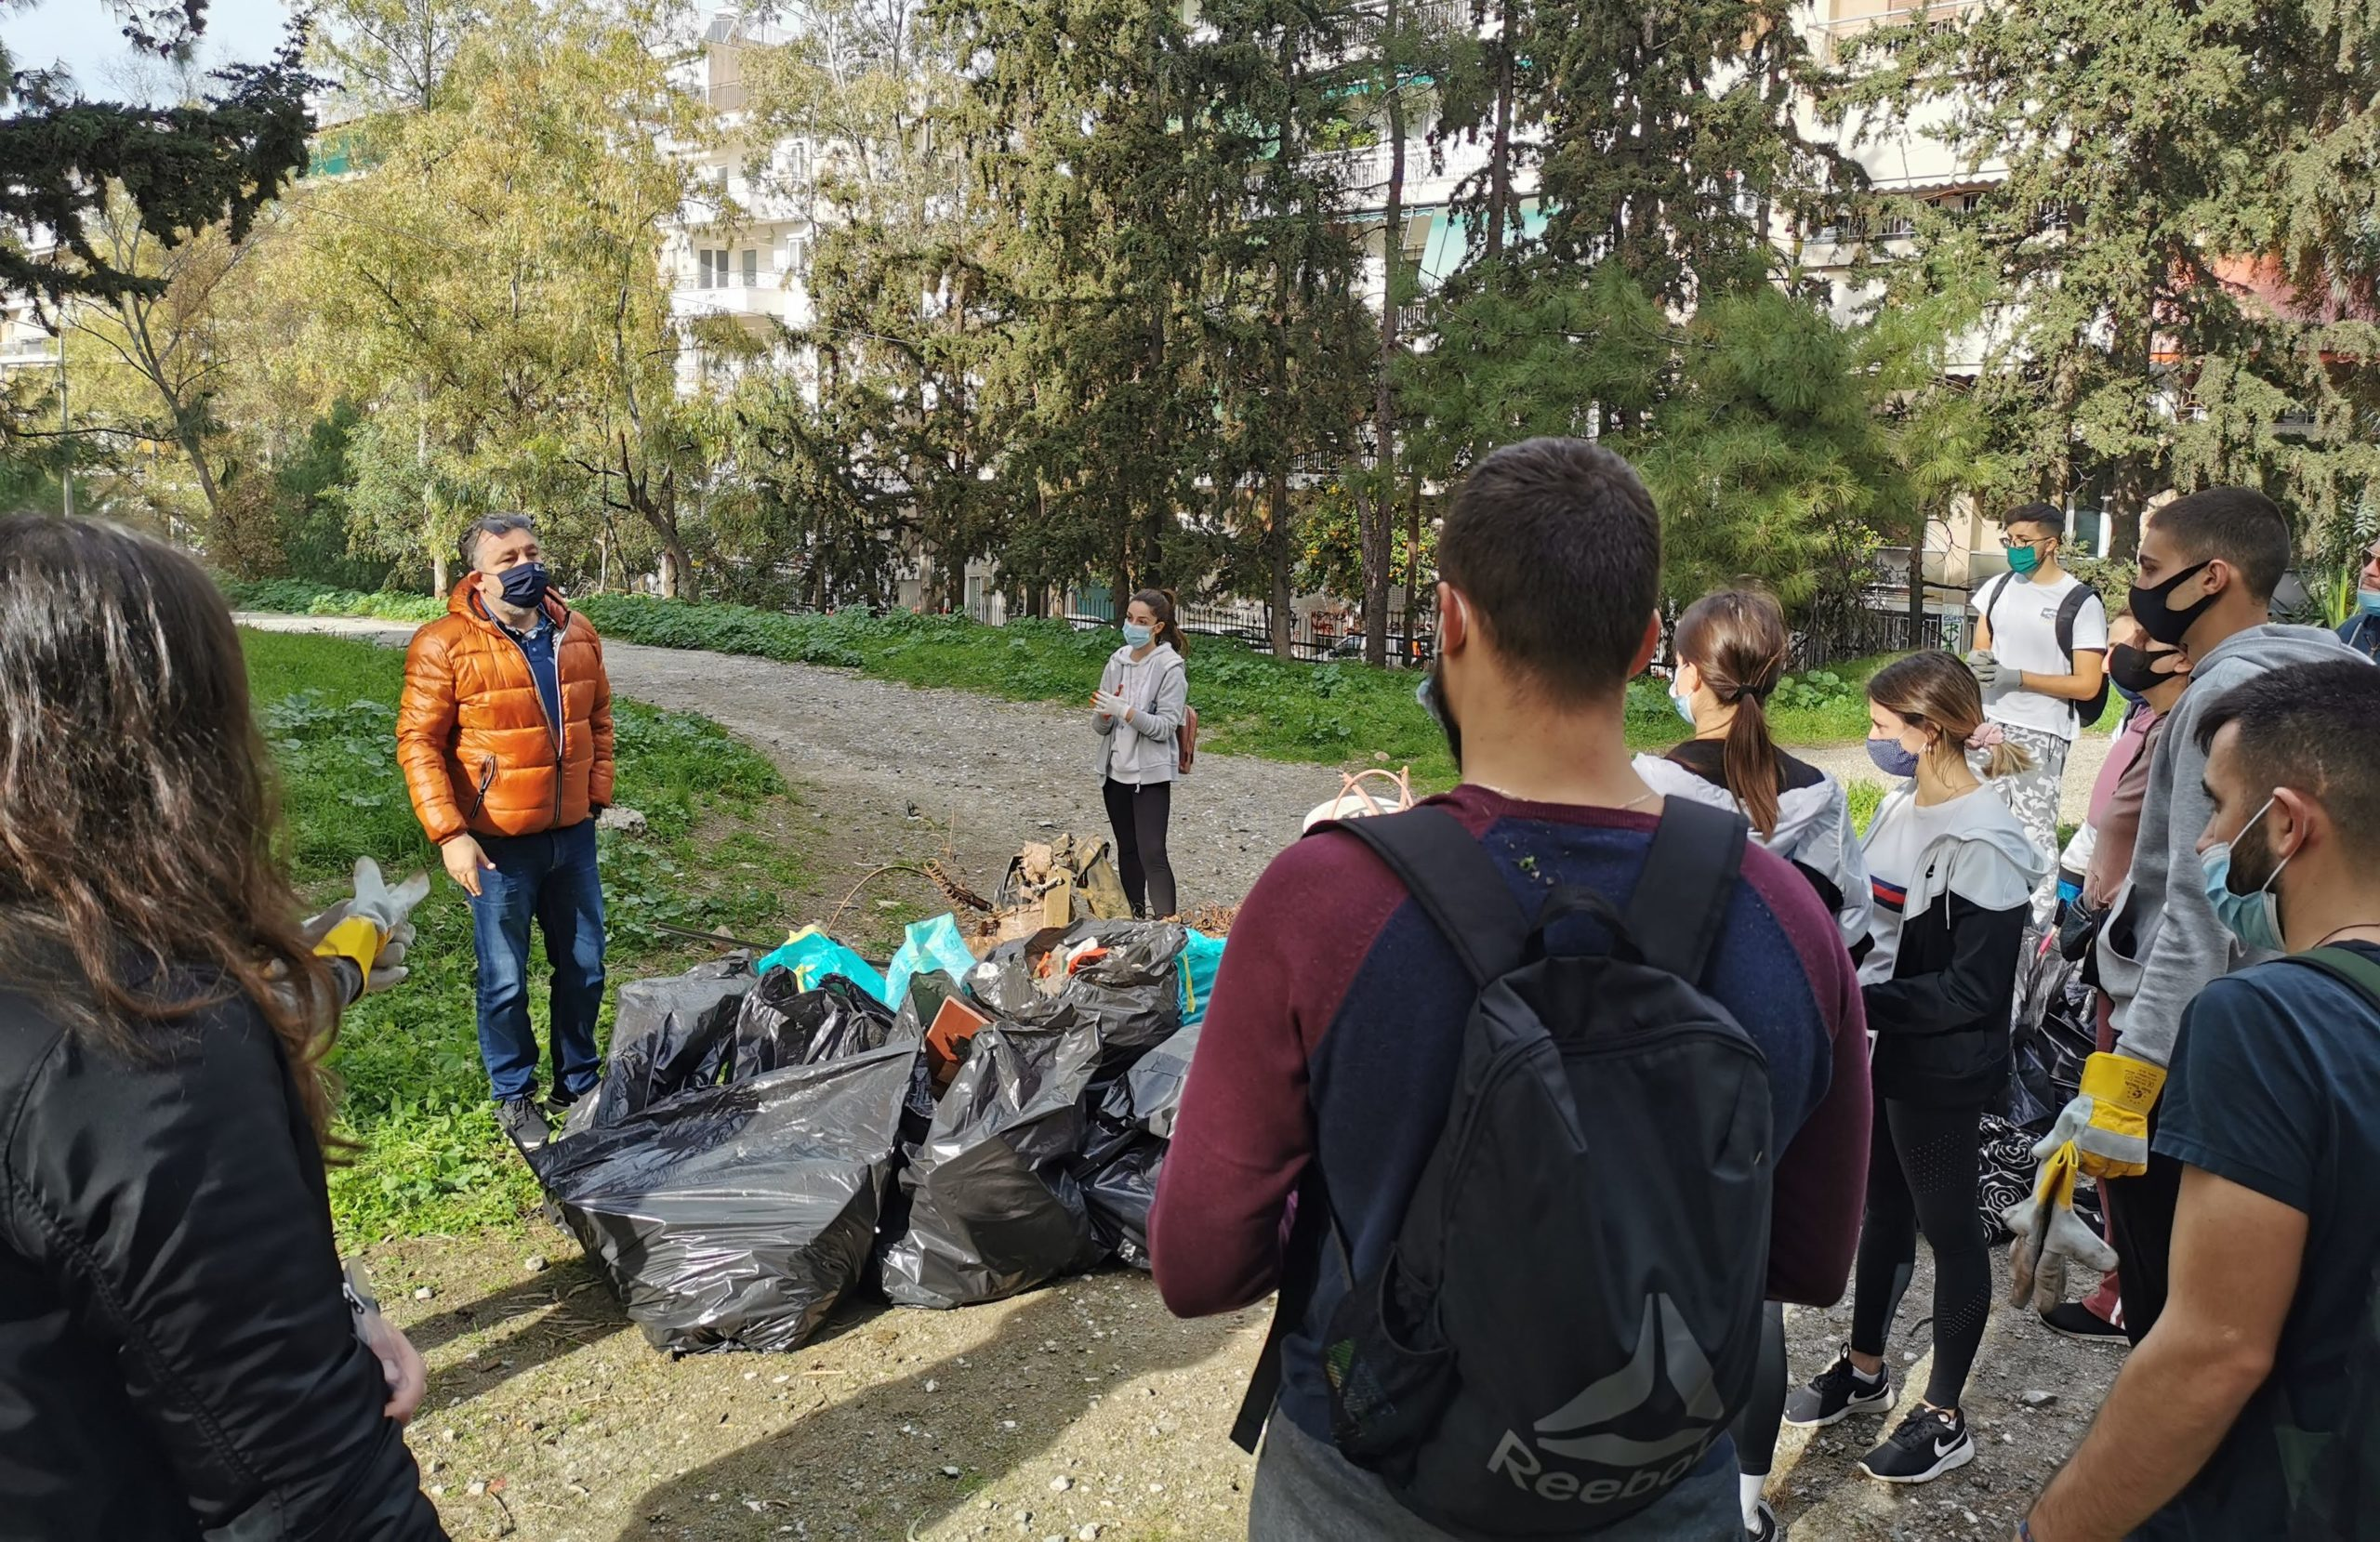 O Δήμος Ζωγράφου στηρίζει την εθελοντική πρωτοβουλία καθαριότητας Save Your Hood